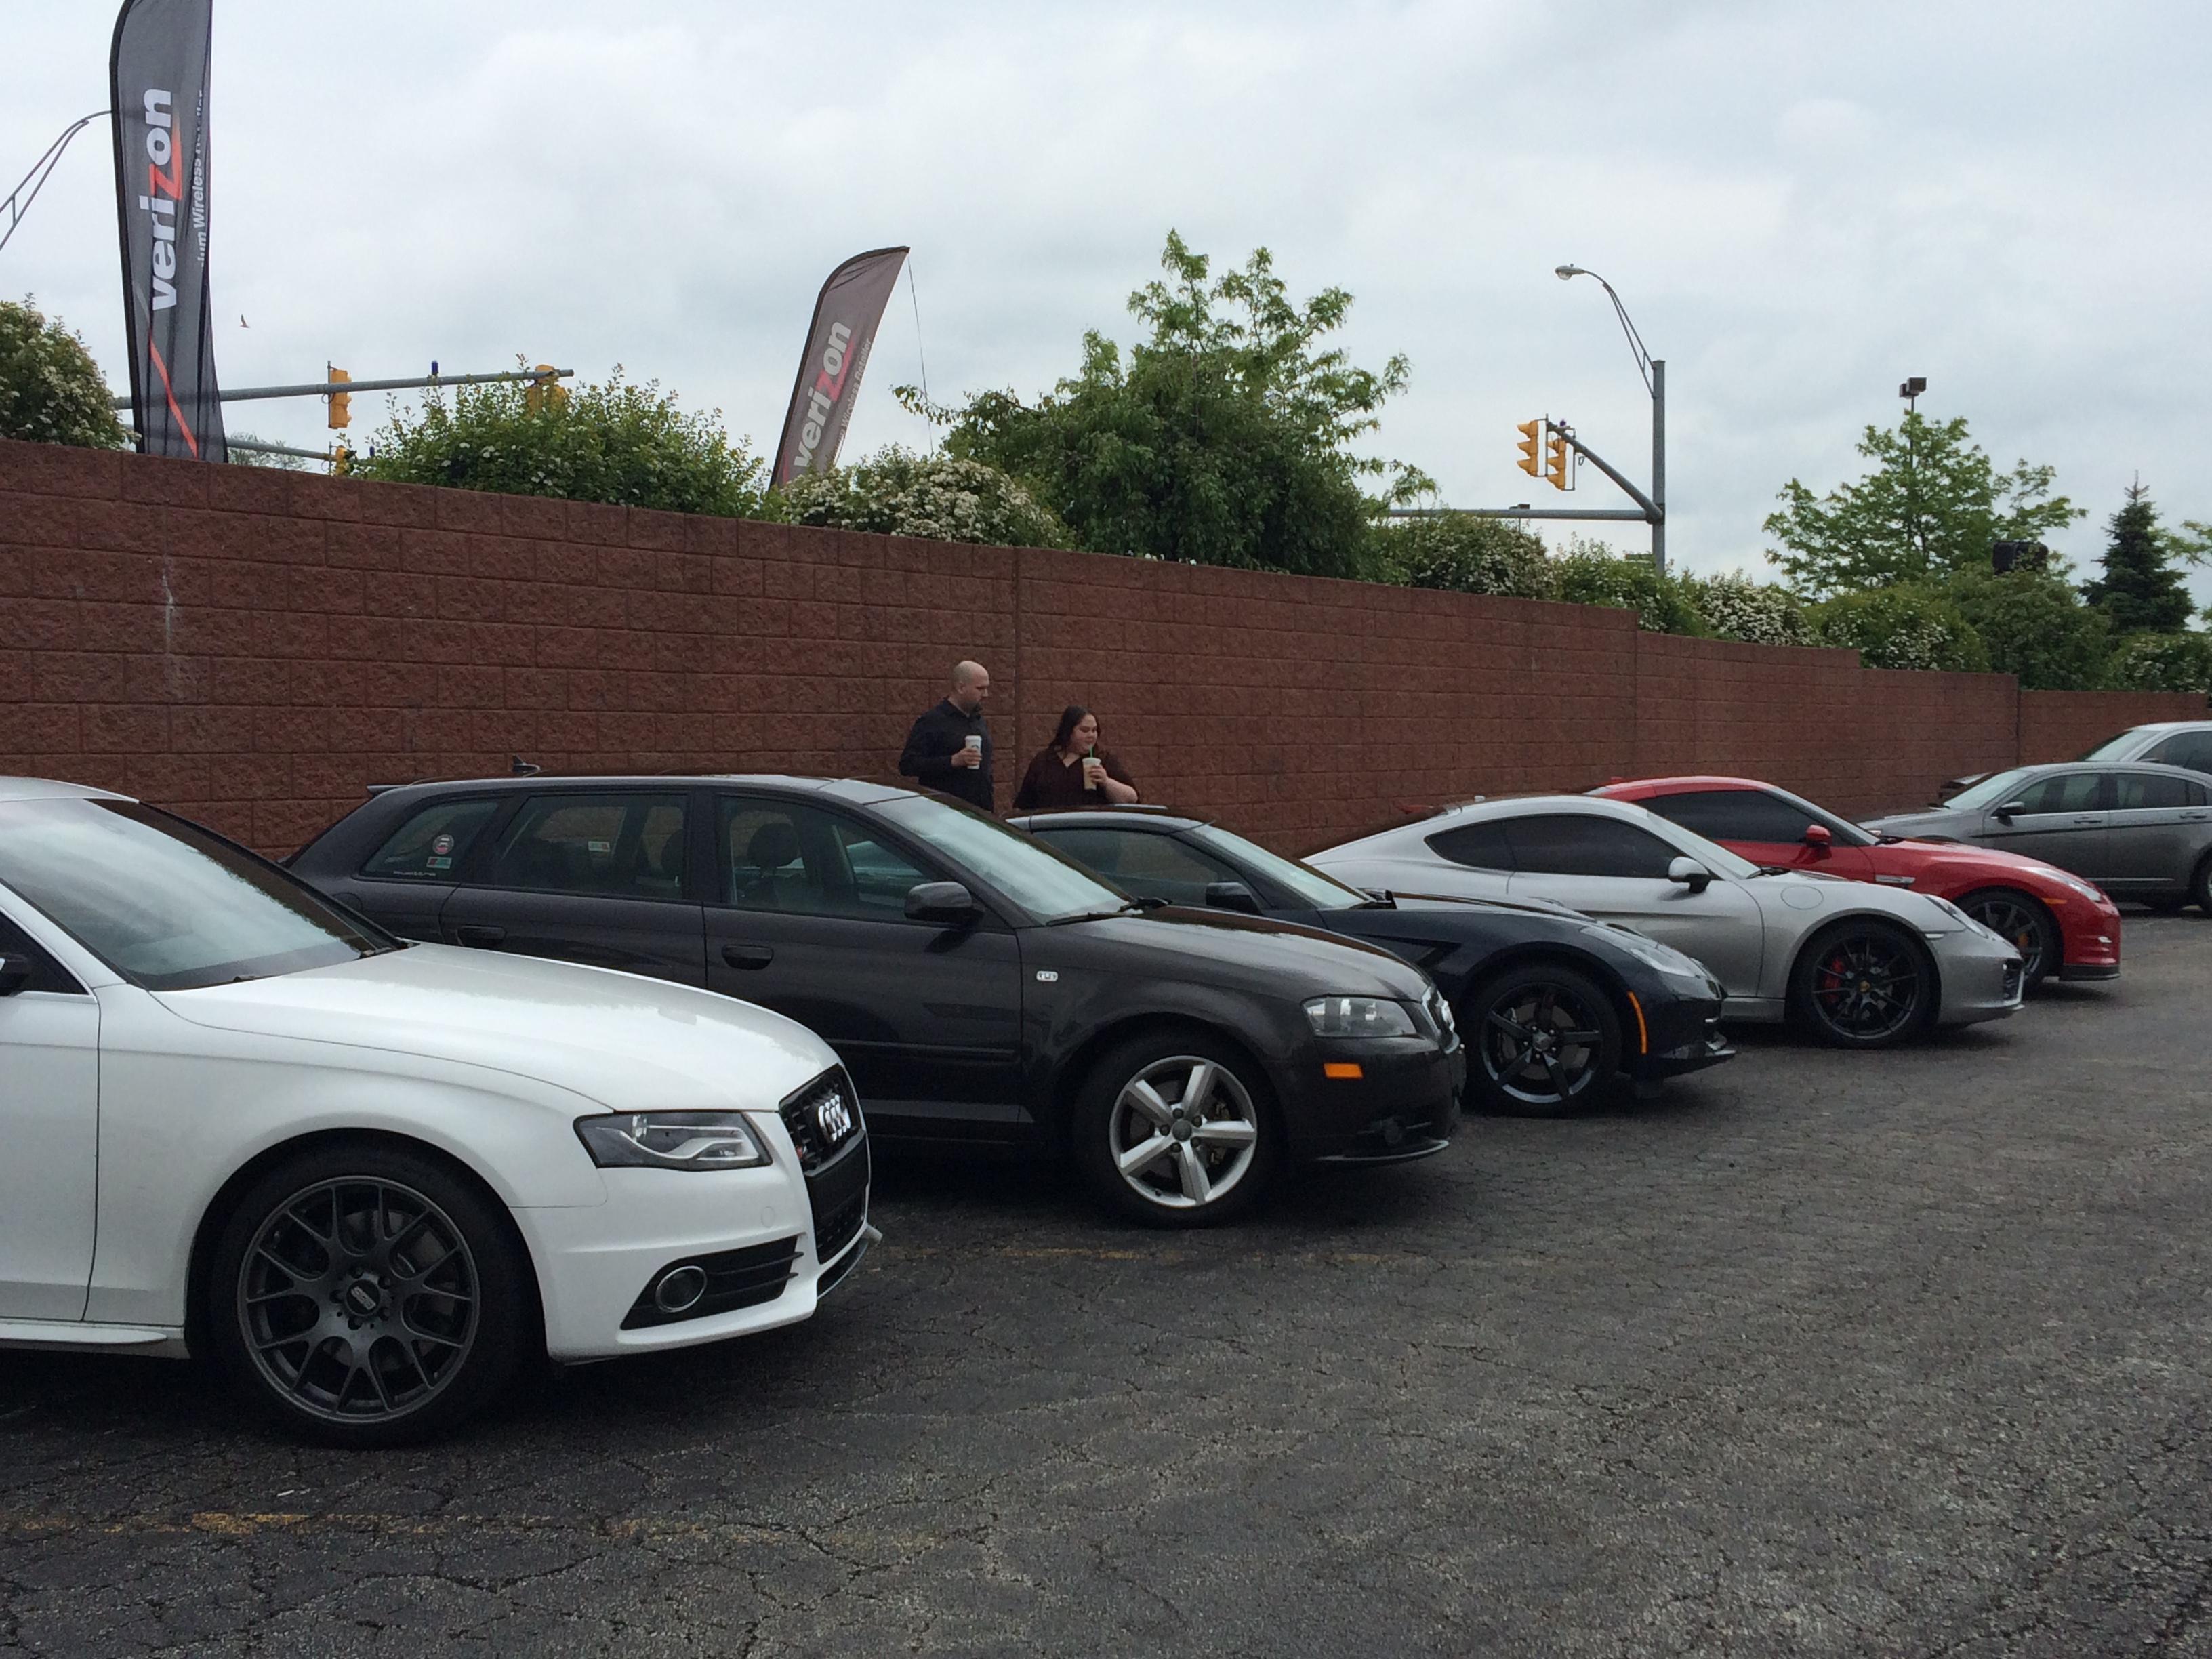 Audi and Porsche